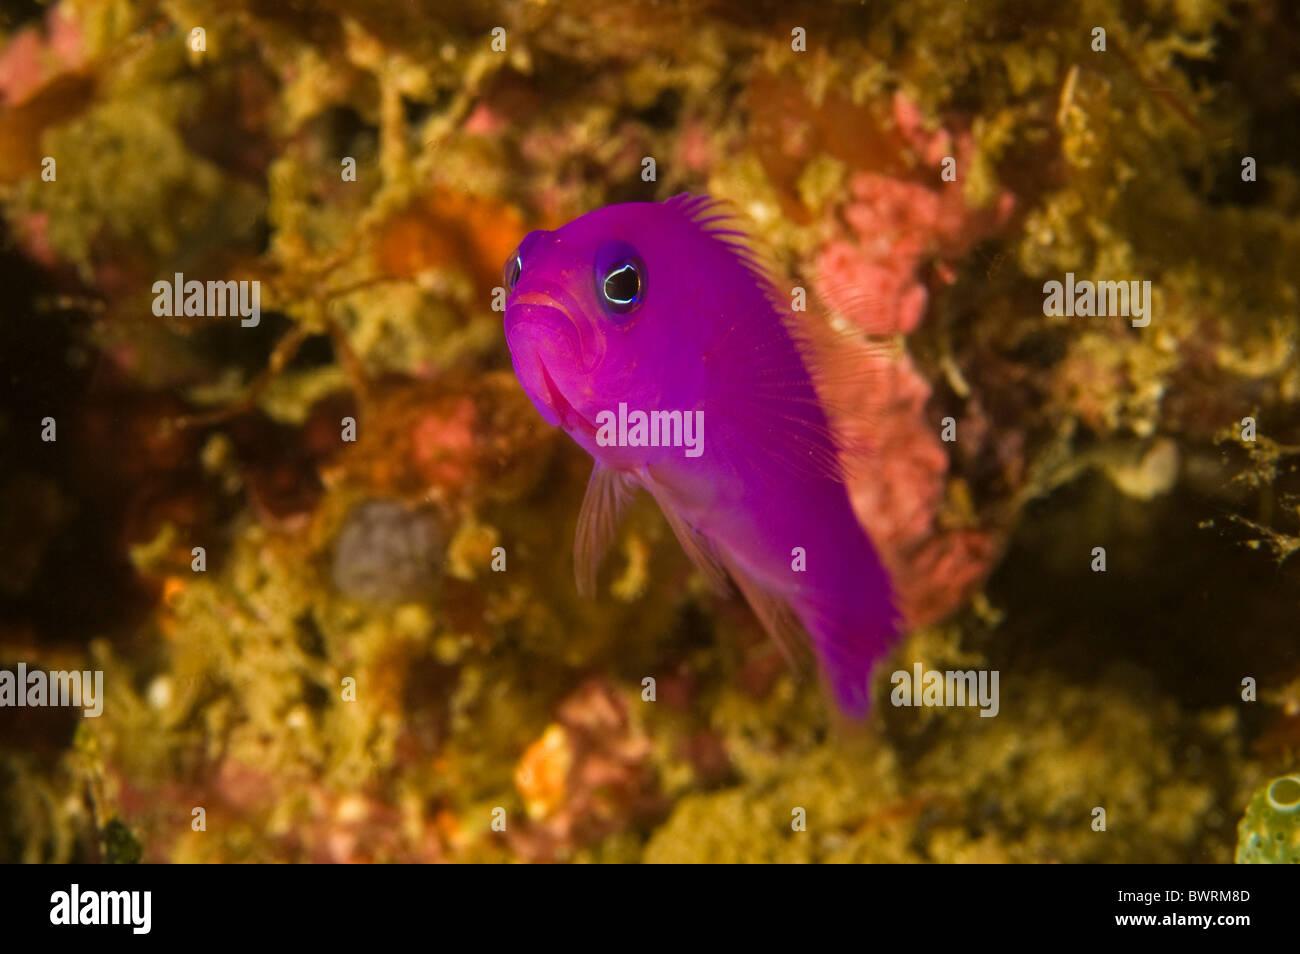 Magenta, dotyback Pseudochromis porphyreus Raja Ampat Indonesia Immagini Stock